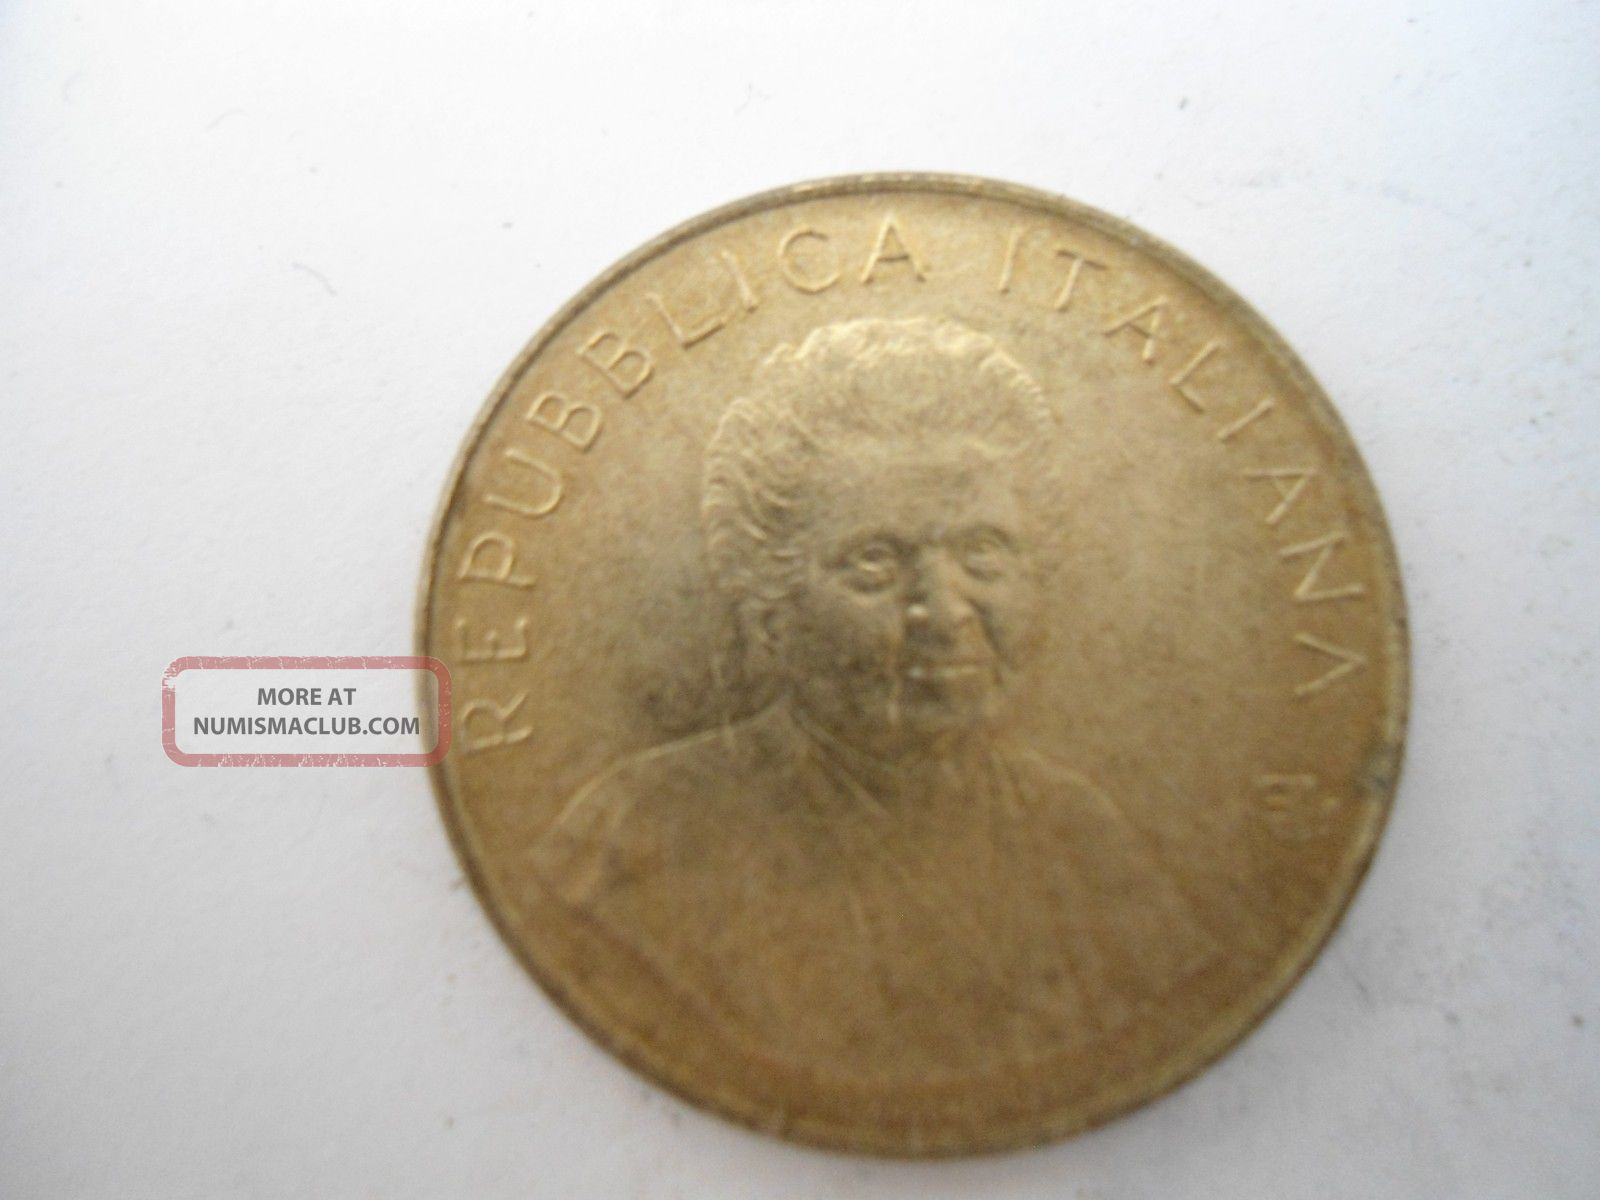 Italy 200 Lire 1980 Fao Series Intel Women´s Year Xf Low S/h Italy, San Marino, Vatican photo